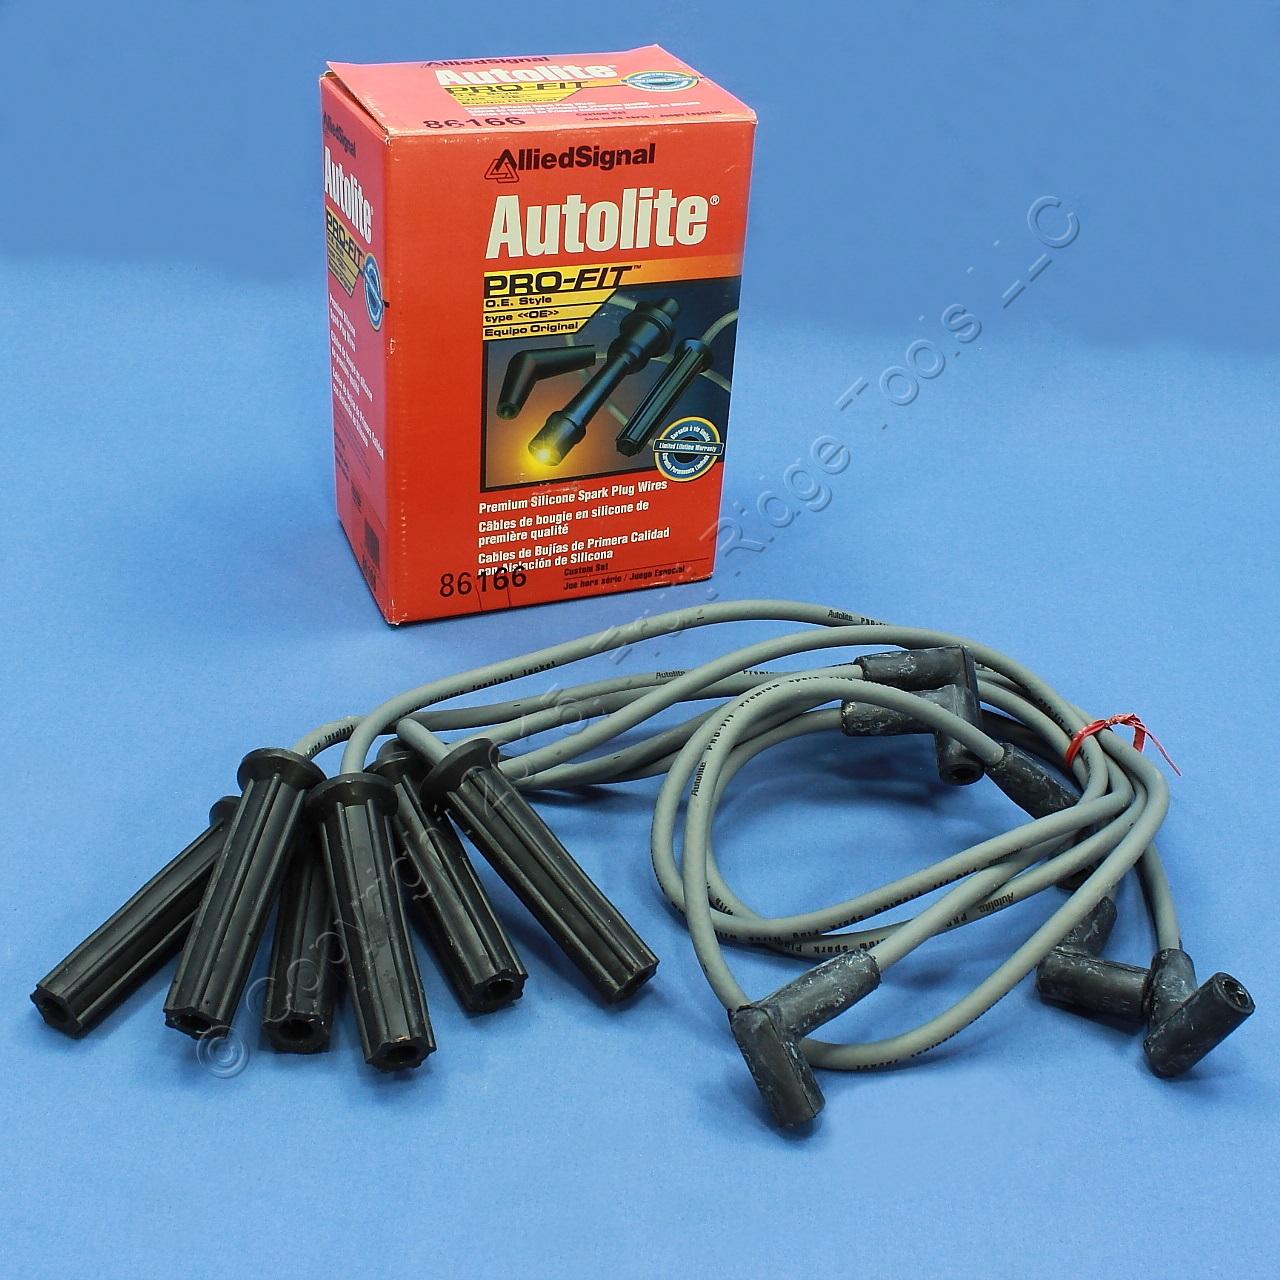 Autolite 86166 Spark Plug Wires for 94 95 Regal Skylark Achieva ...